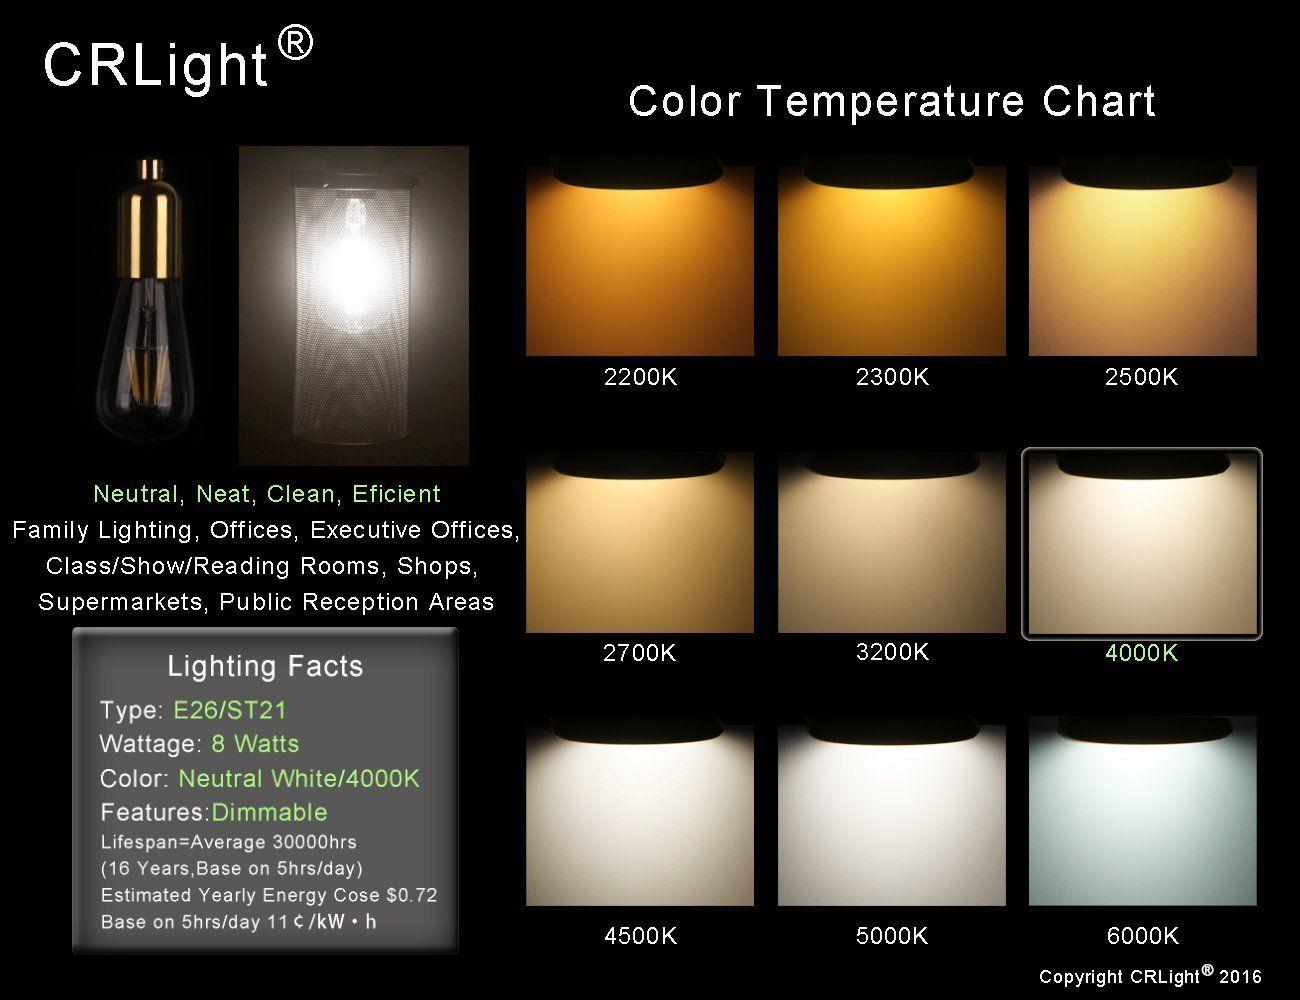 Crlight 8w Dimmable Edison Style Vintage Led Filament Light Bulb 4000k Daylight Led Decorative Lights Decorative Light Bulbs Light Bulb Candle